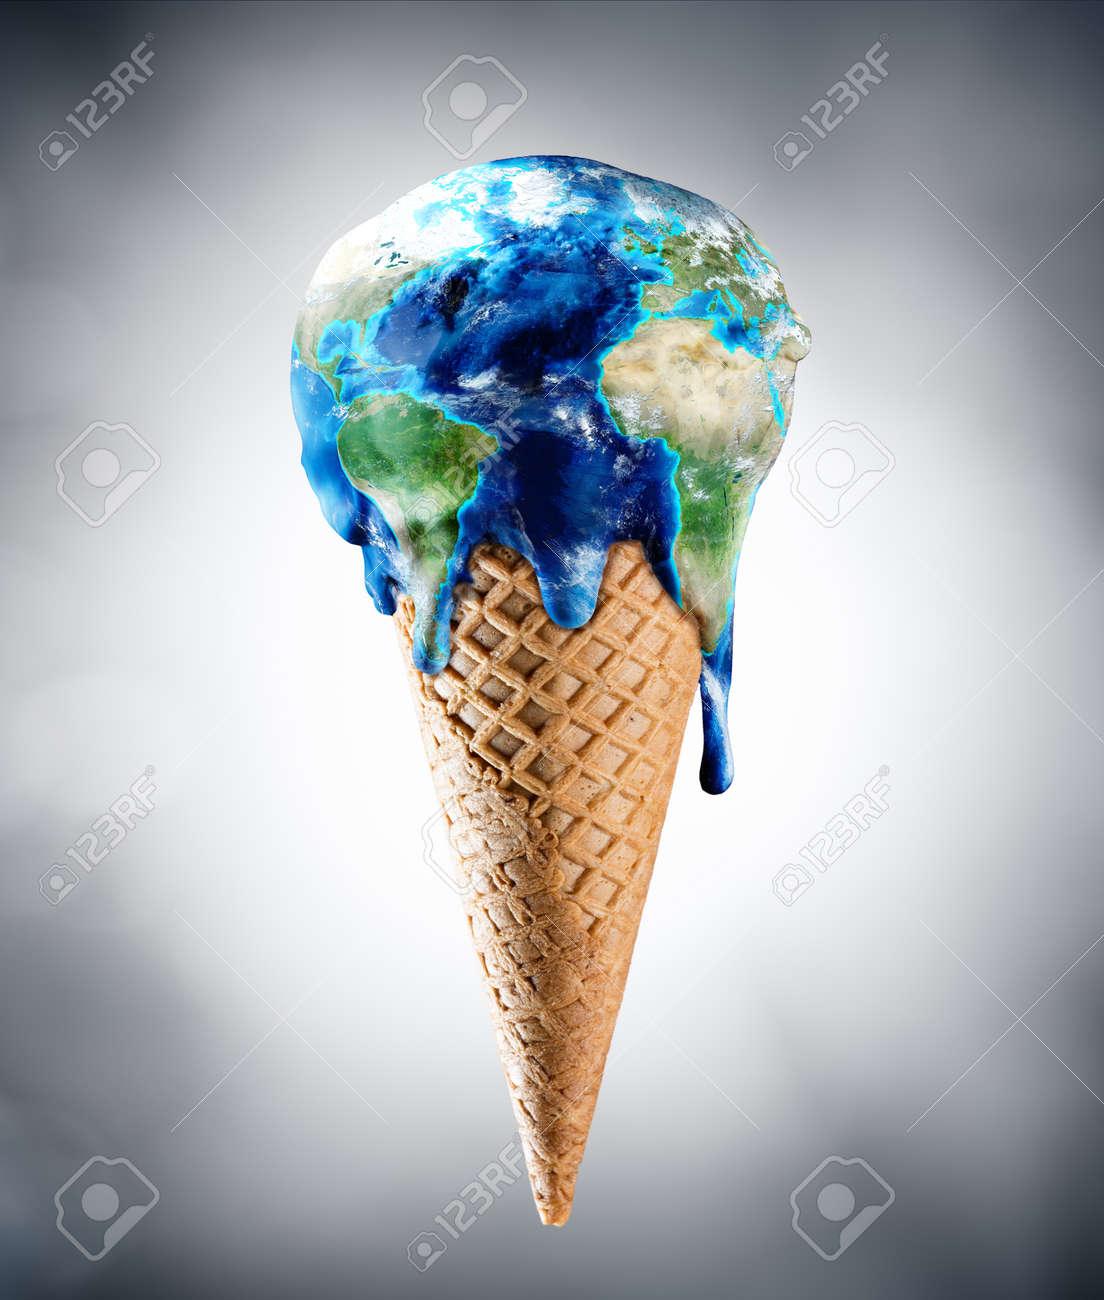 Ice Cream World - Climate Change Concept - 54425400